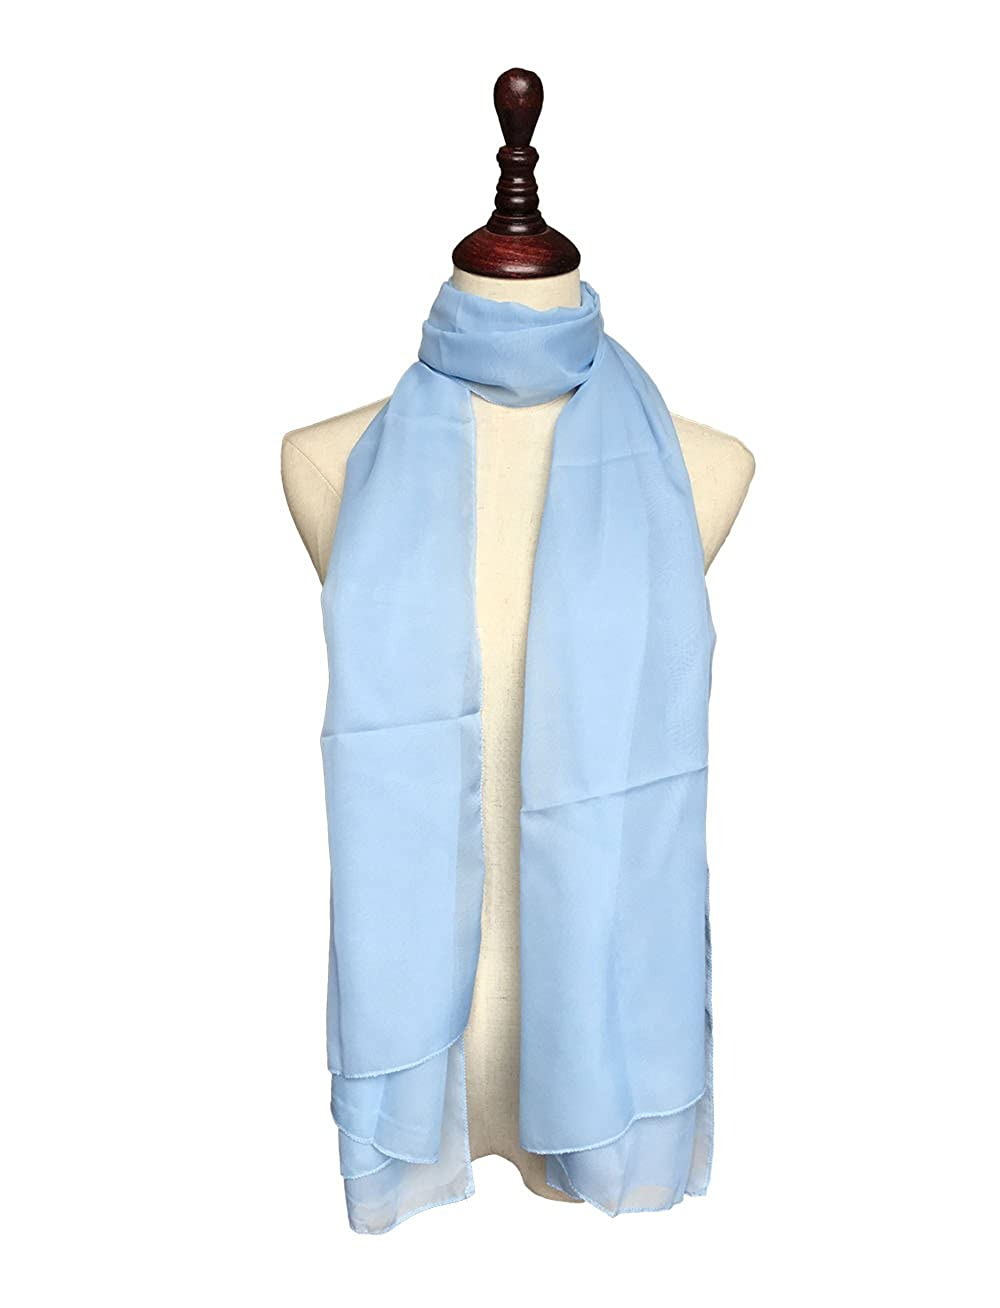 Topmode Etole /écharpe femme en mousseline polyester